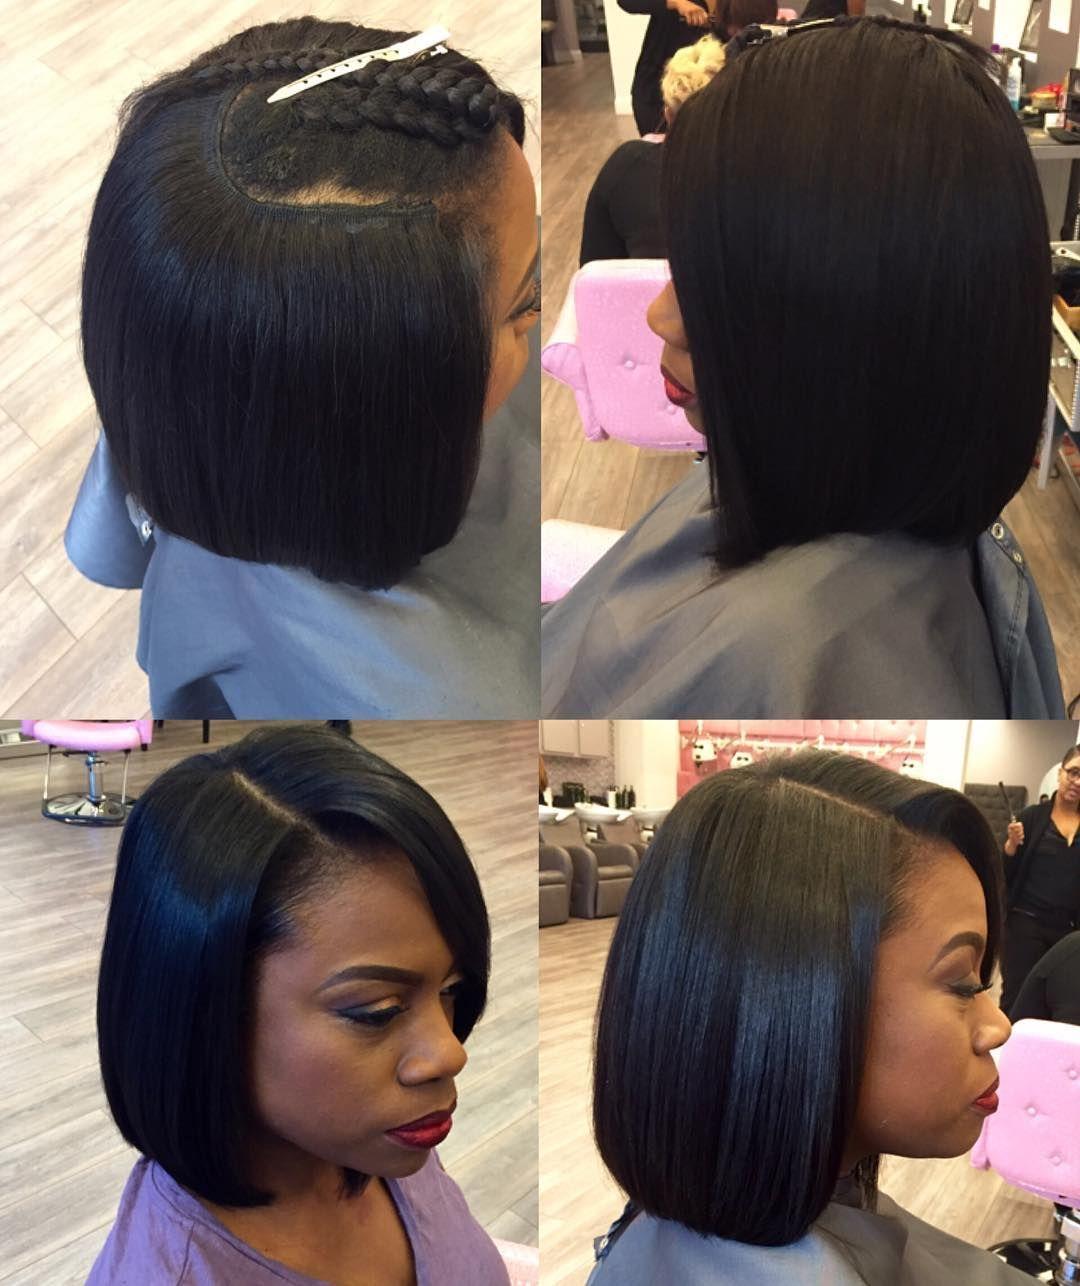 259 Likes 5 Comments Treana Tre Ismyname On Instagram Quick Weave Bob Quick Weav Quick Weave Hairstyles Weave Hairstyles Black Hairstyles With Weave